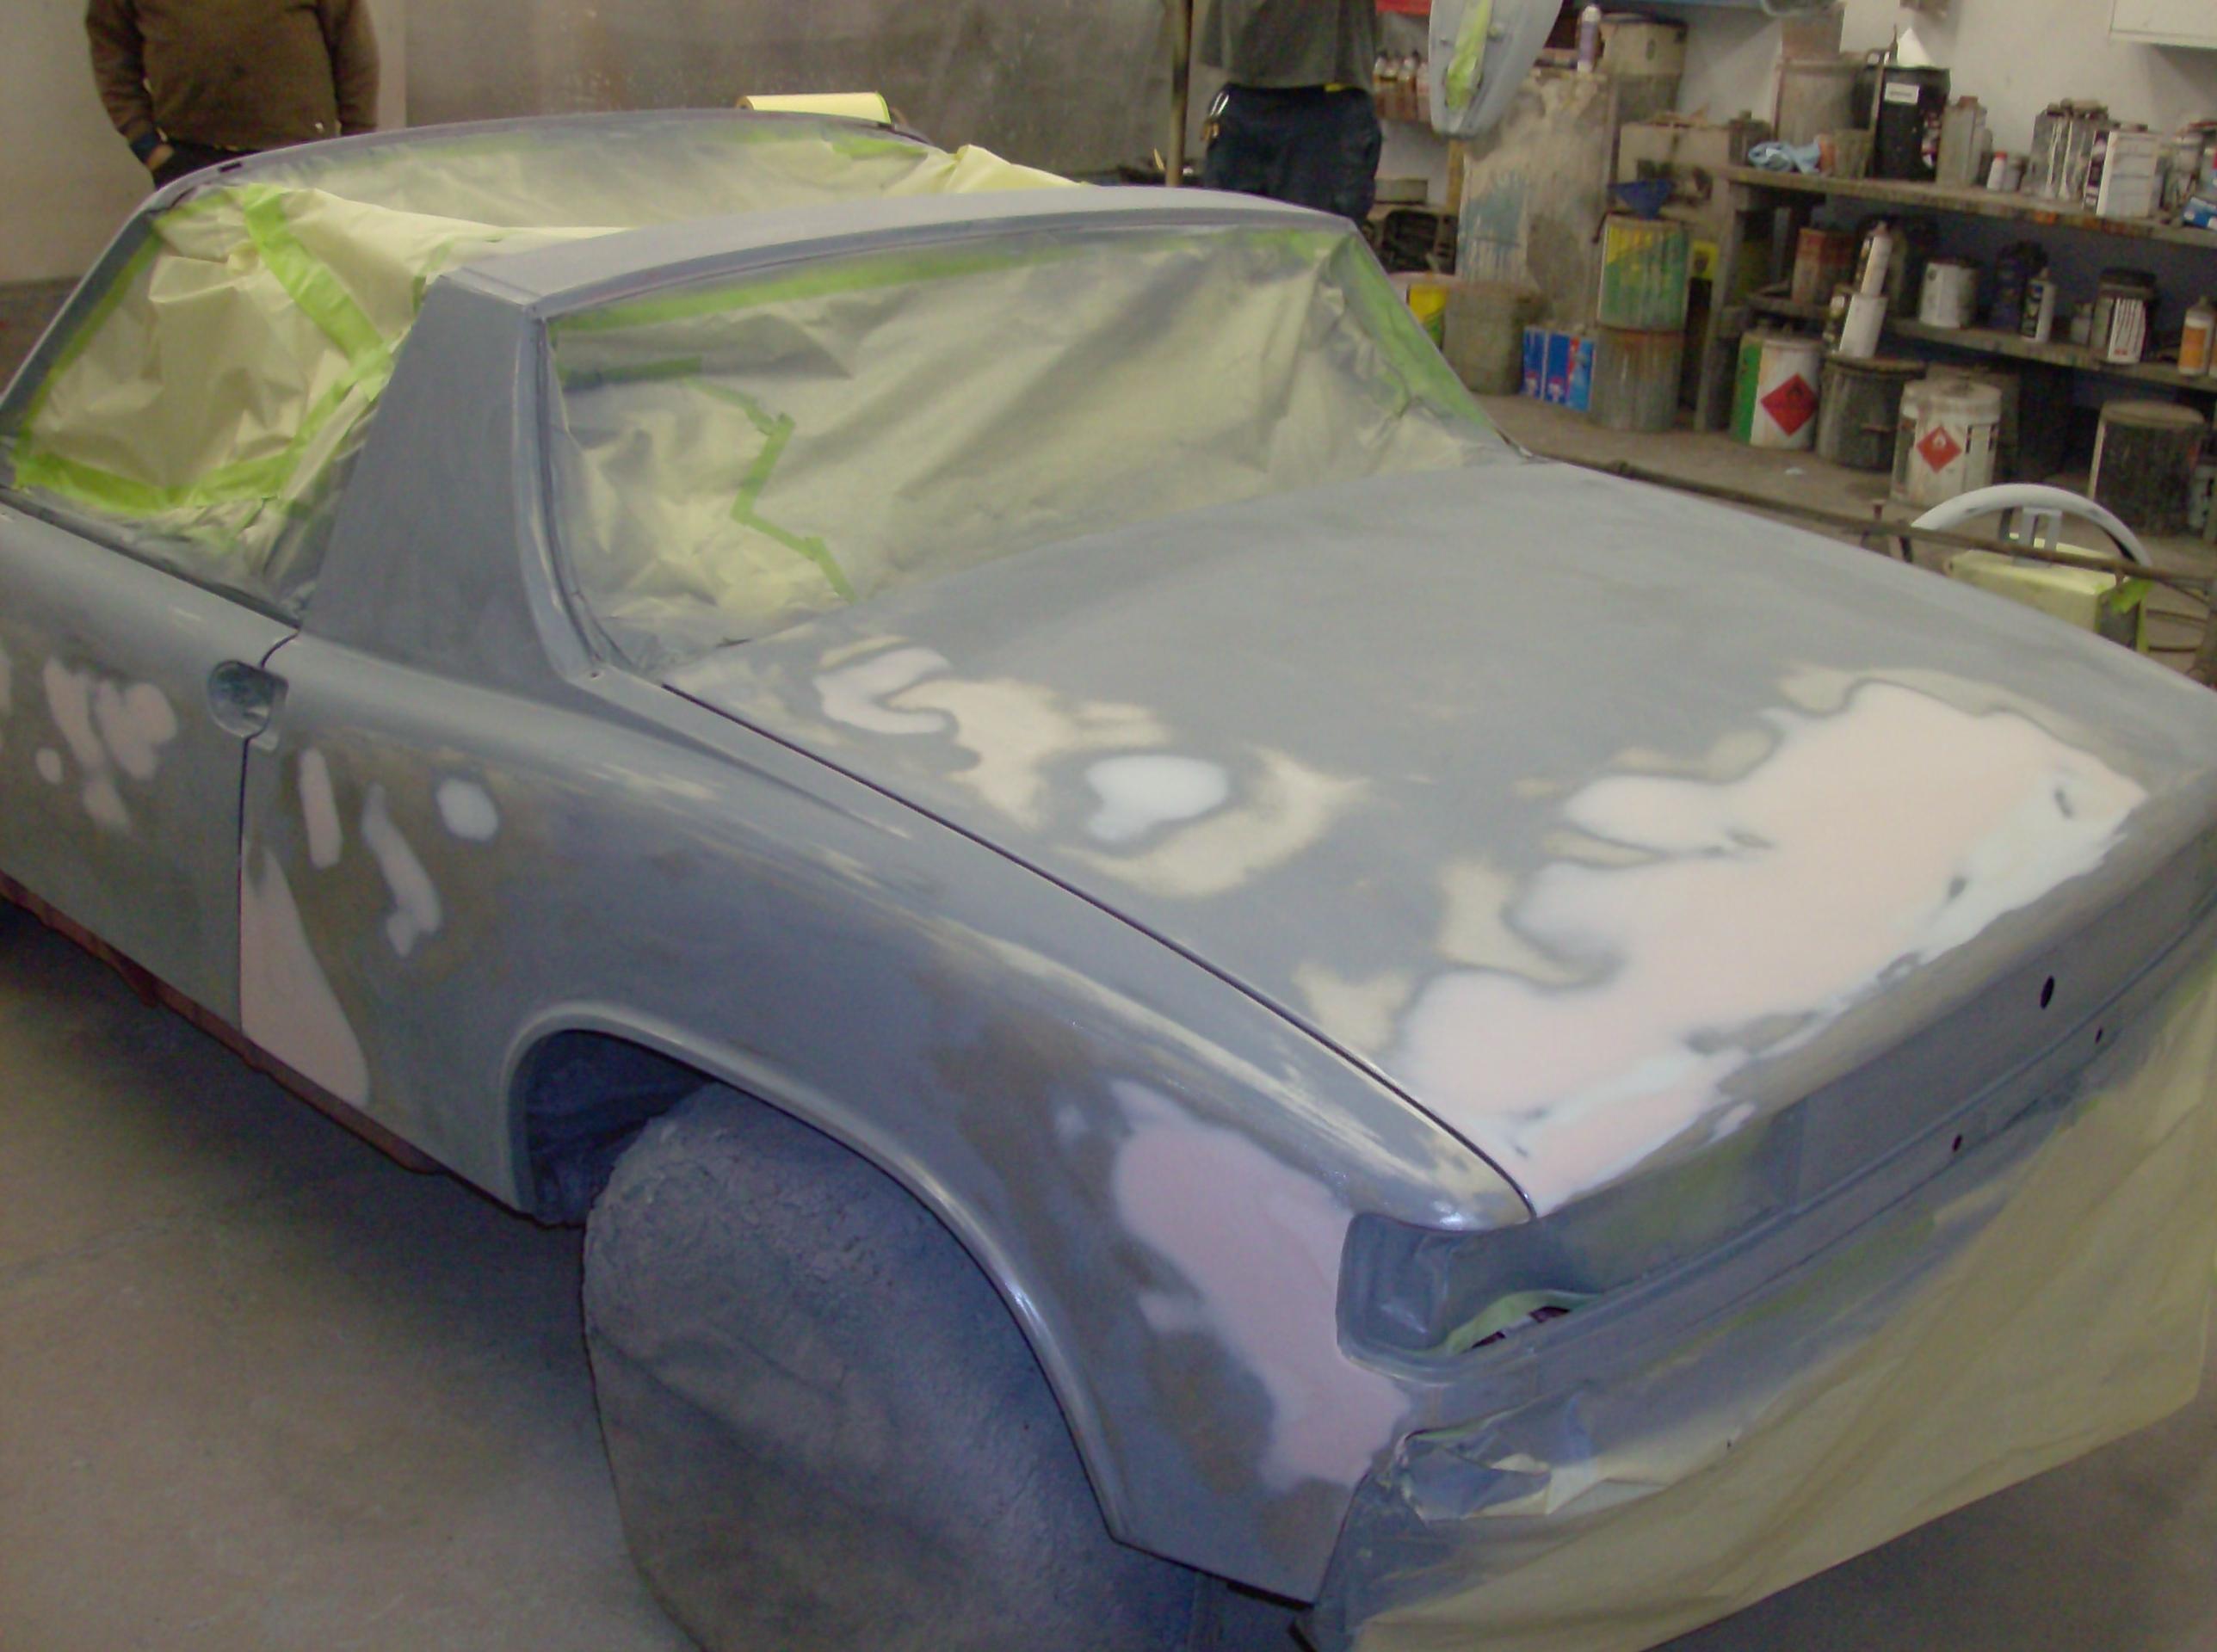 Porshe 914 Restoration